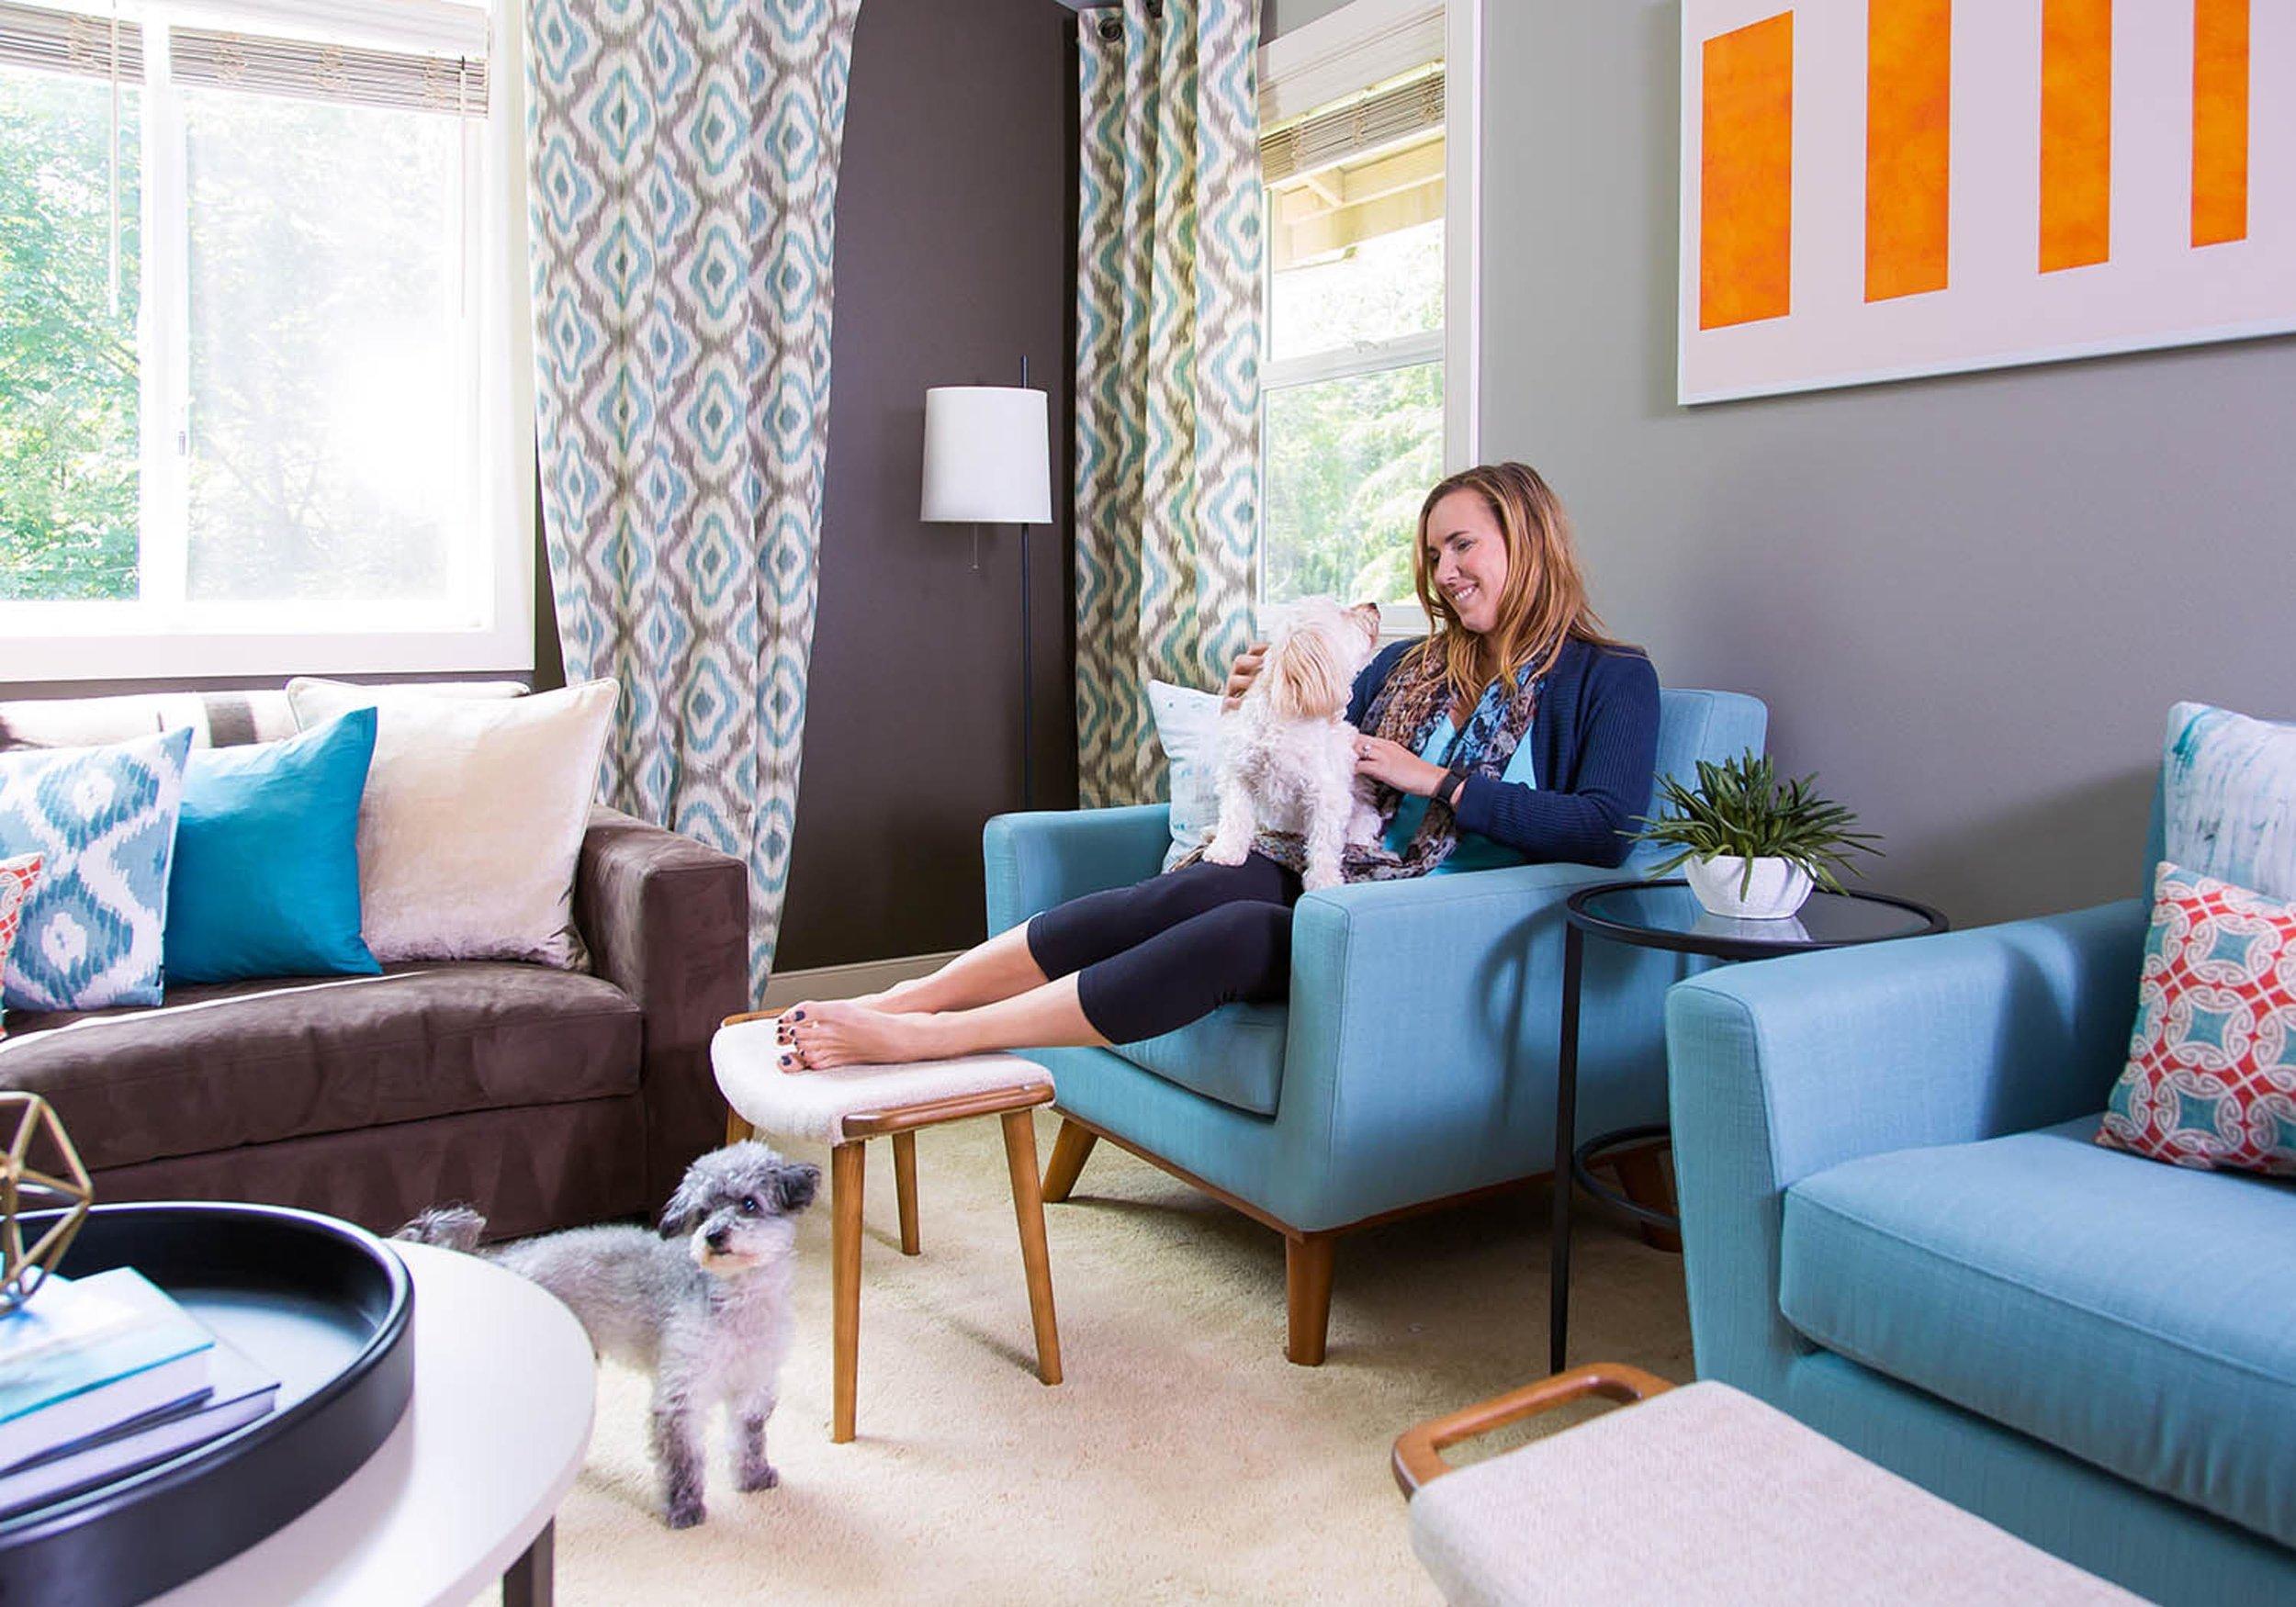 modern designed living room with stylish sofa